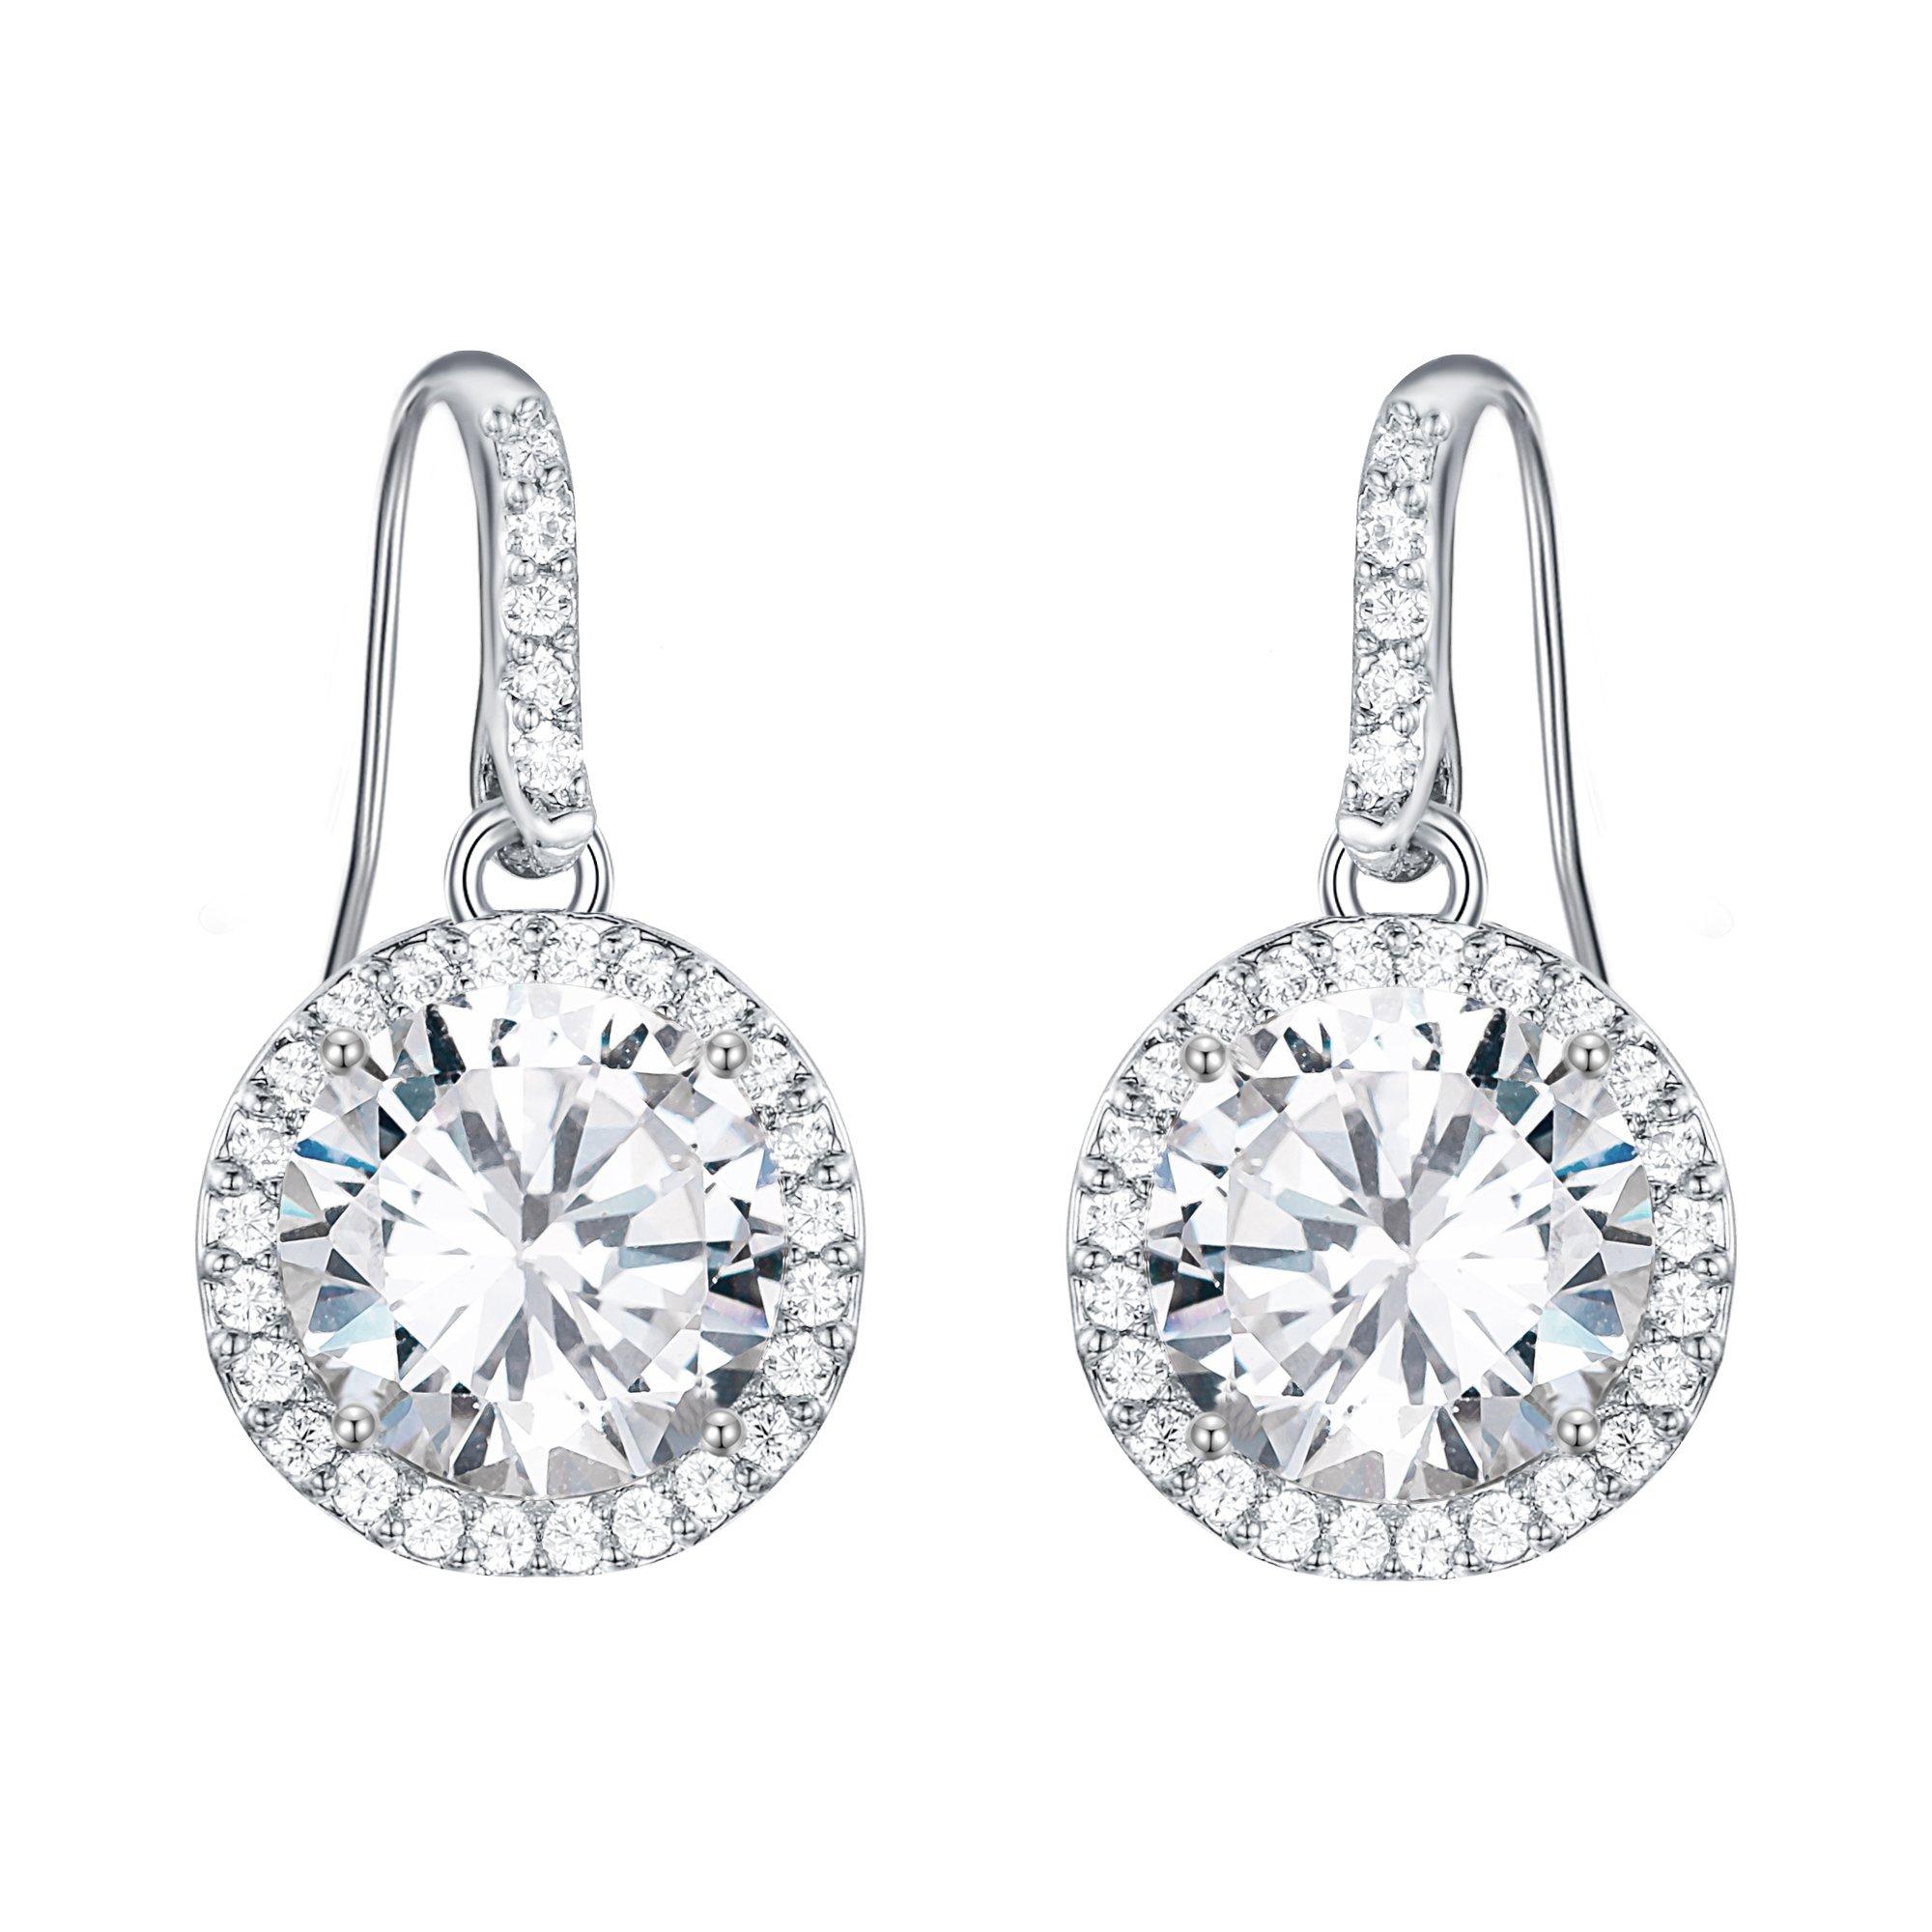 EVER FAITH Round Zircon Elegant Wedding Dangle Hook Earrings Clear Silver-Tone for Women, Brides